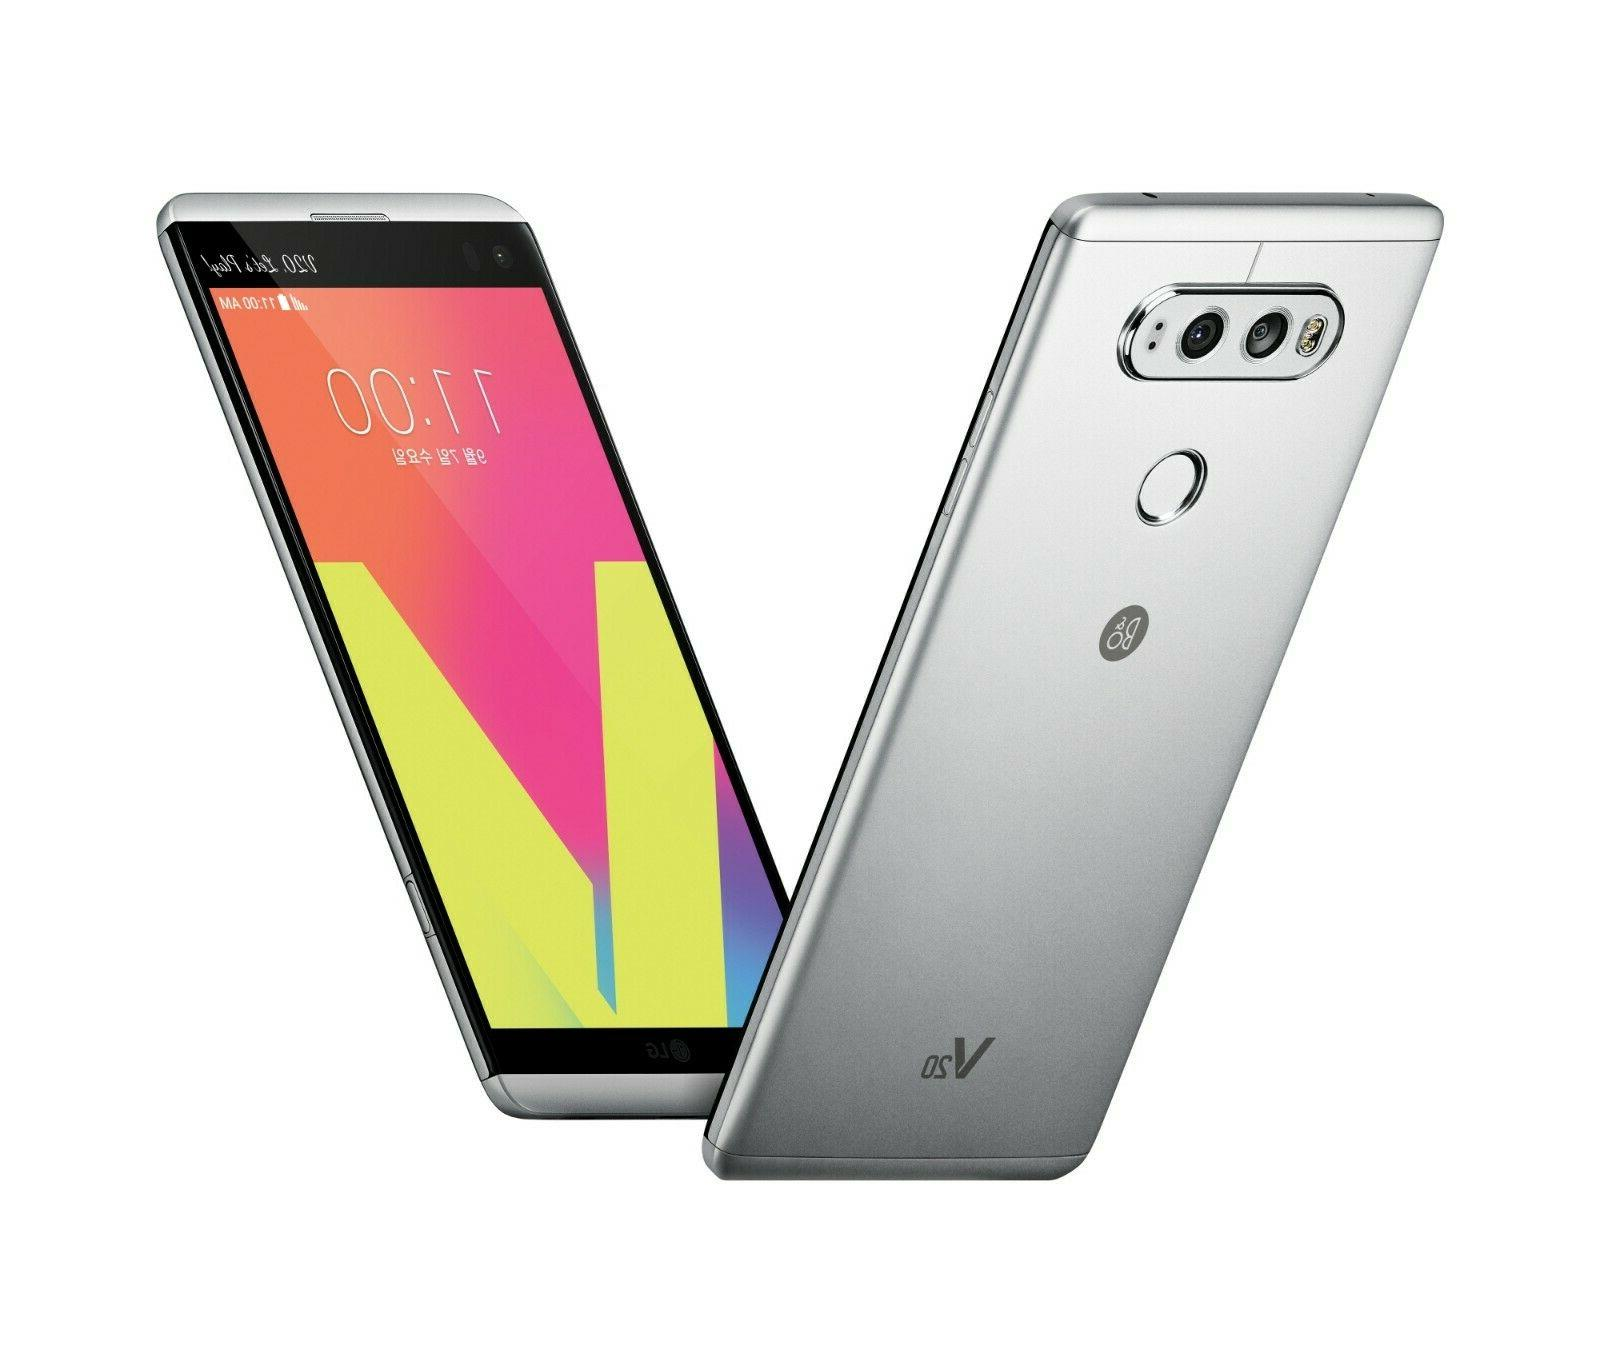 LG V20 - 64GB - LTE Simply Silver Smartphone